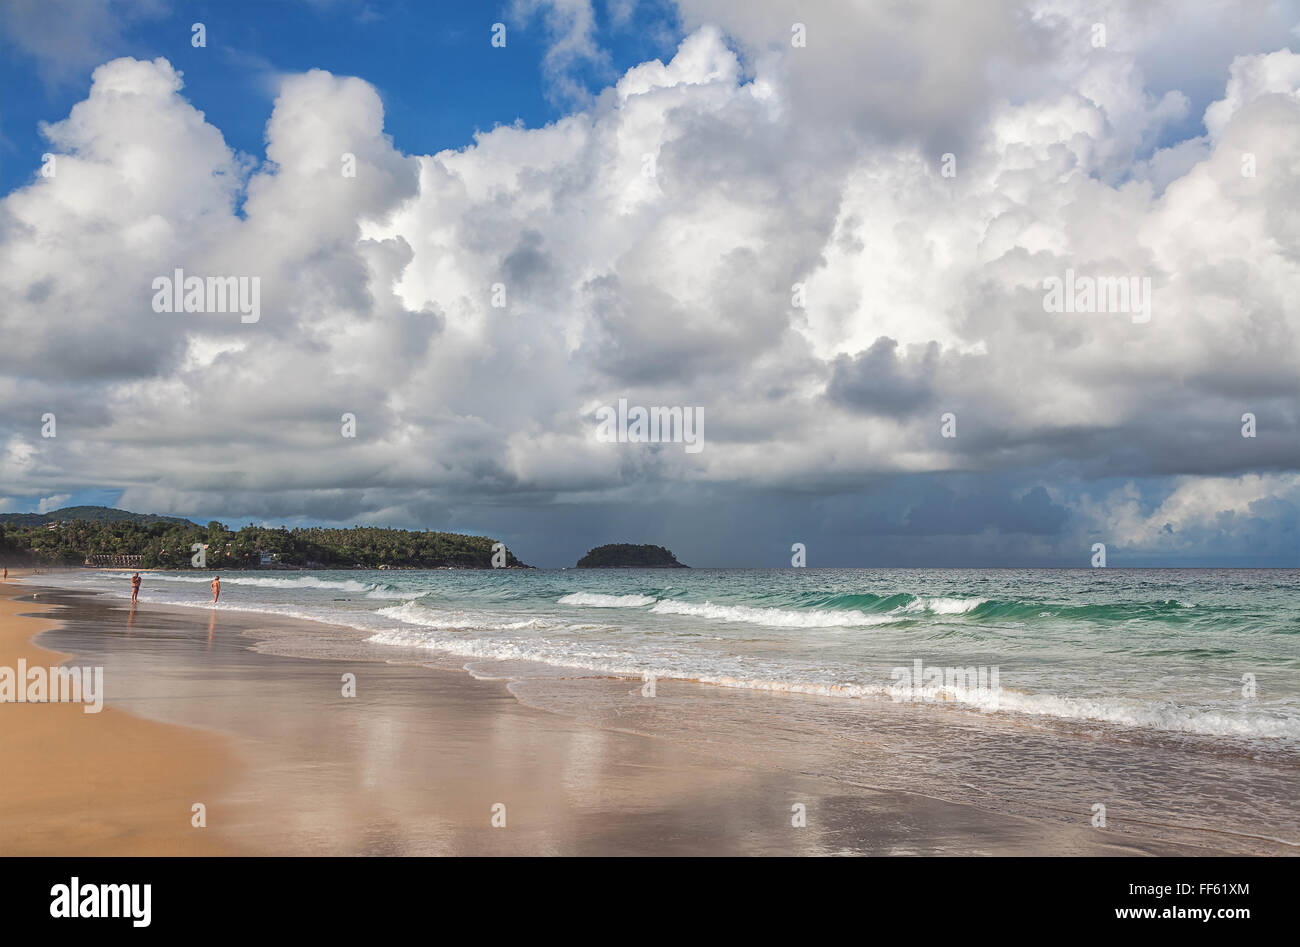 Morning on the island of Phuket in Thailand - Stock Image